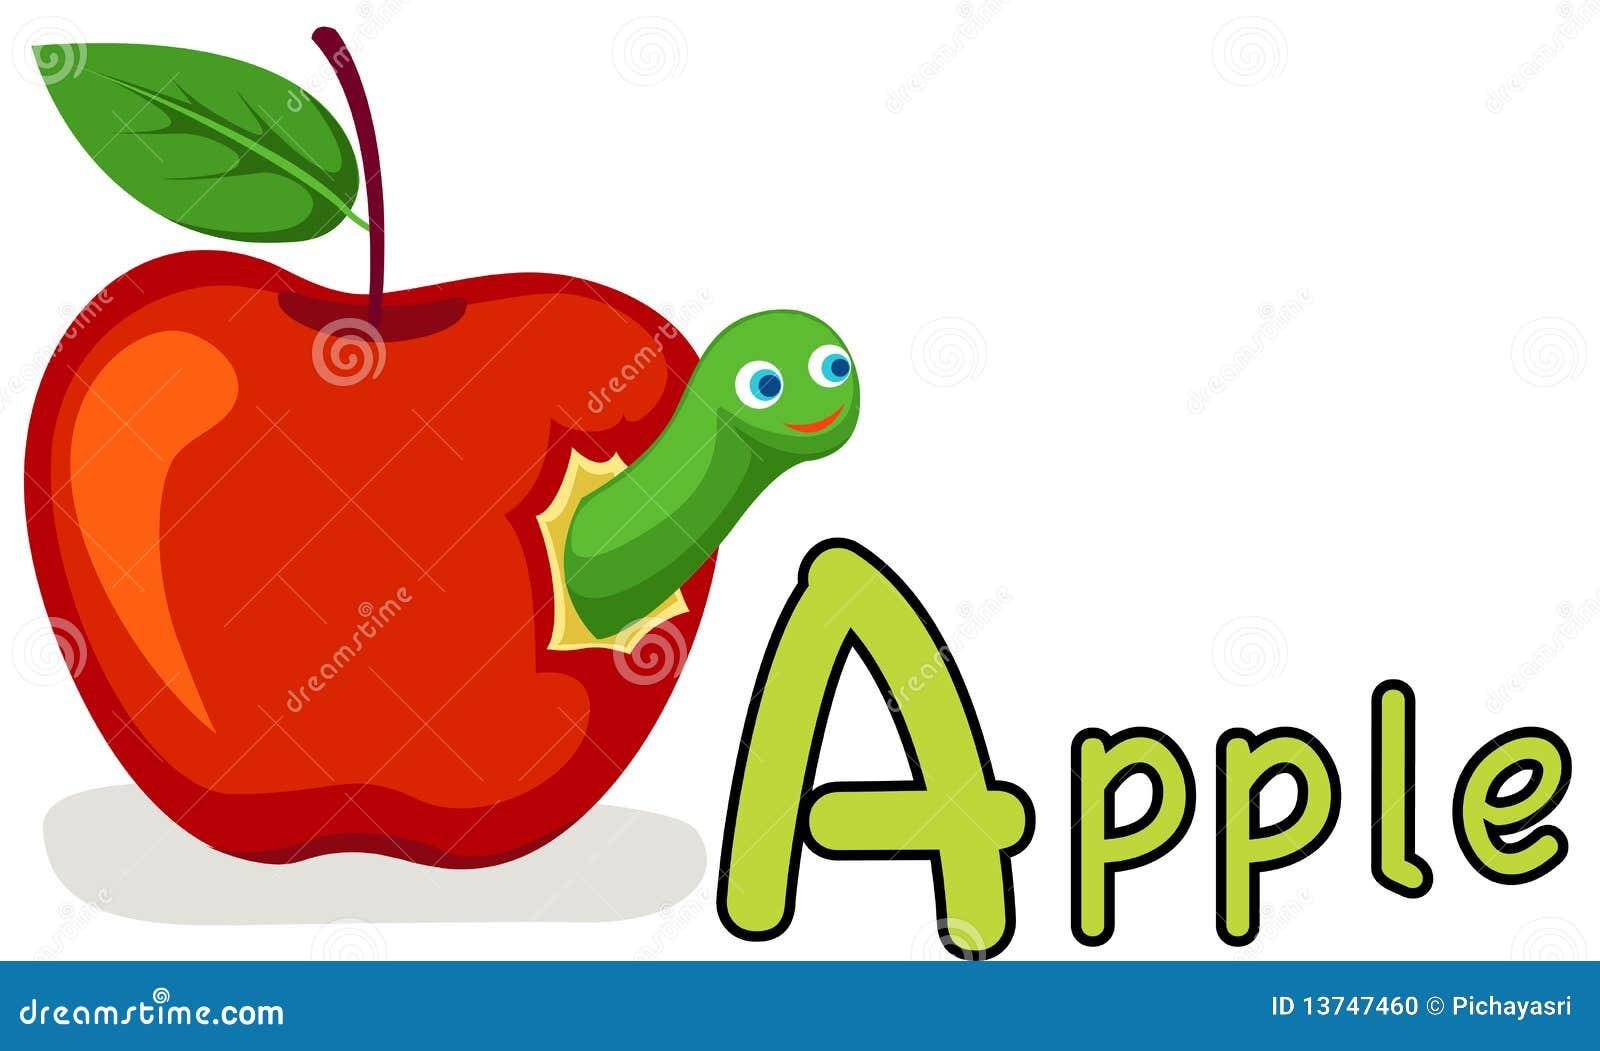 alphabet a for apple stock photo image 13747460 duck clip art images duck clip art for kids